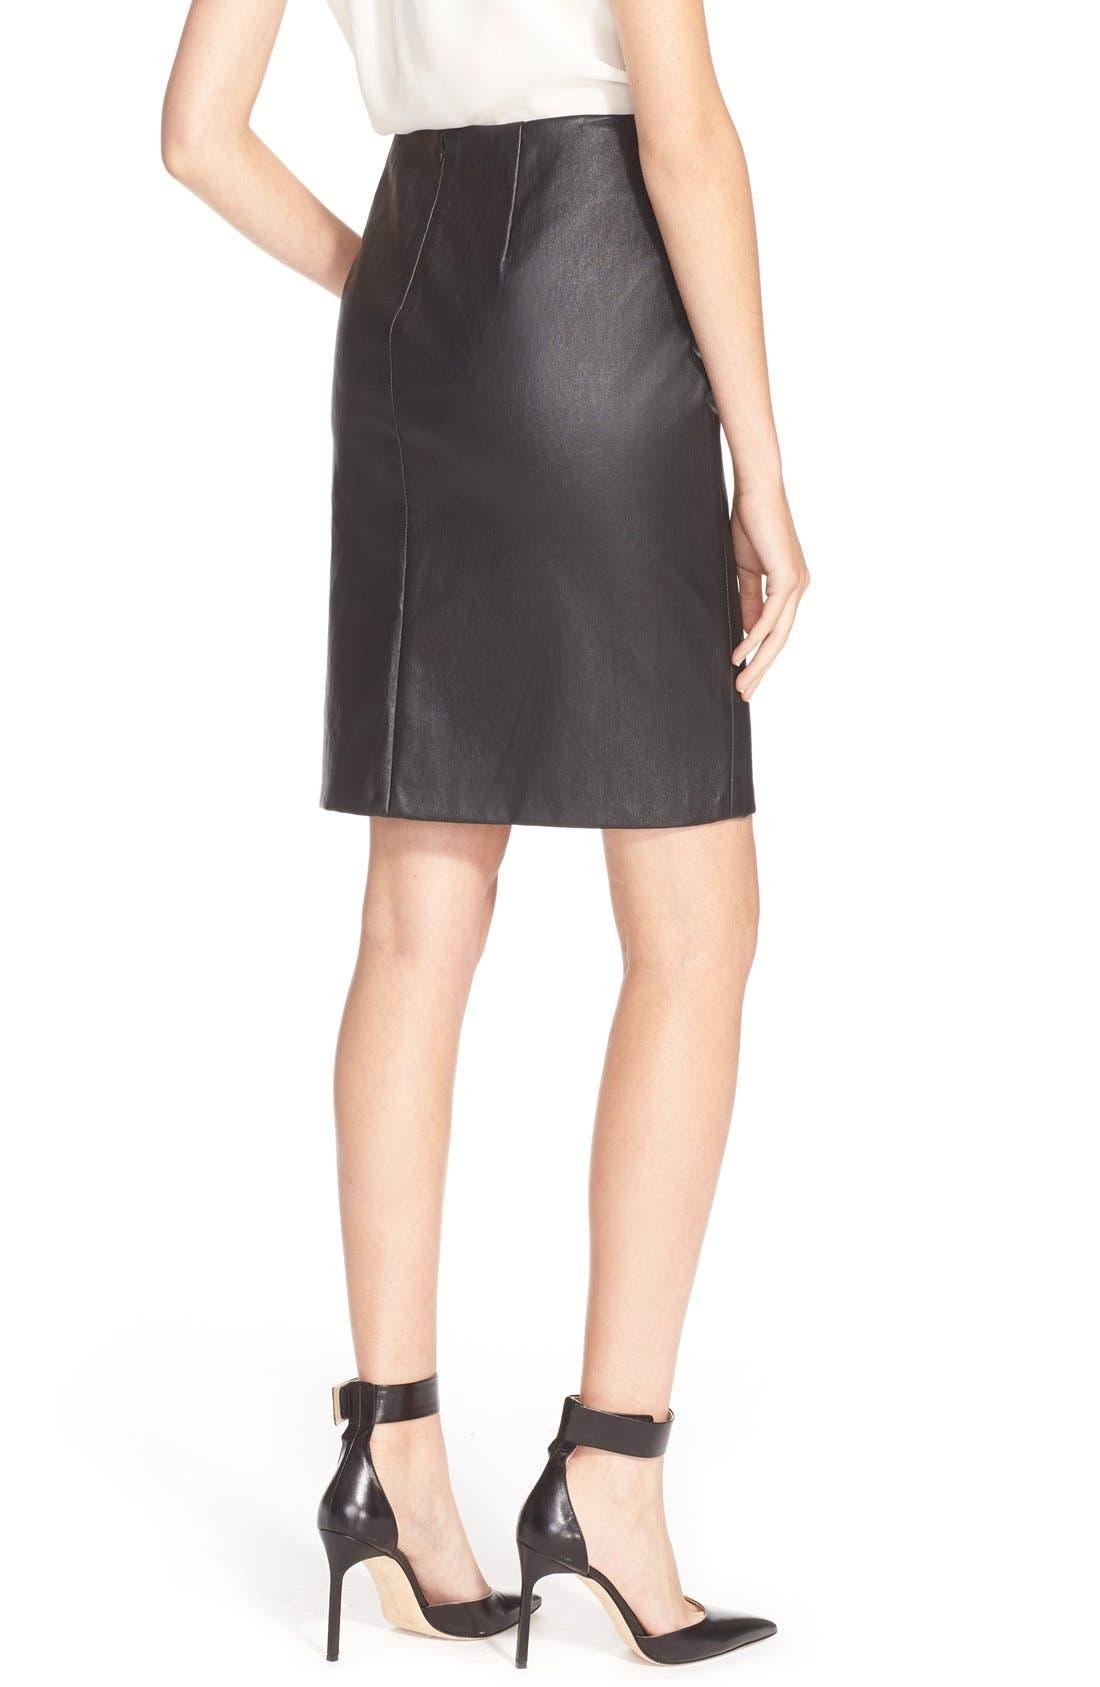 Alternate Image 2  - Diane vonFurstenberg'Cloe' Leather Pencil Skirt